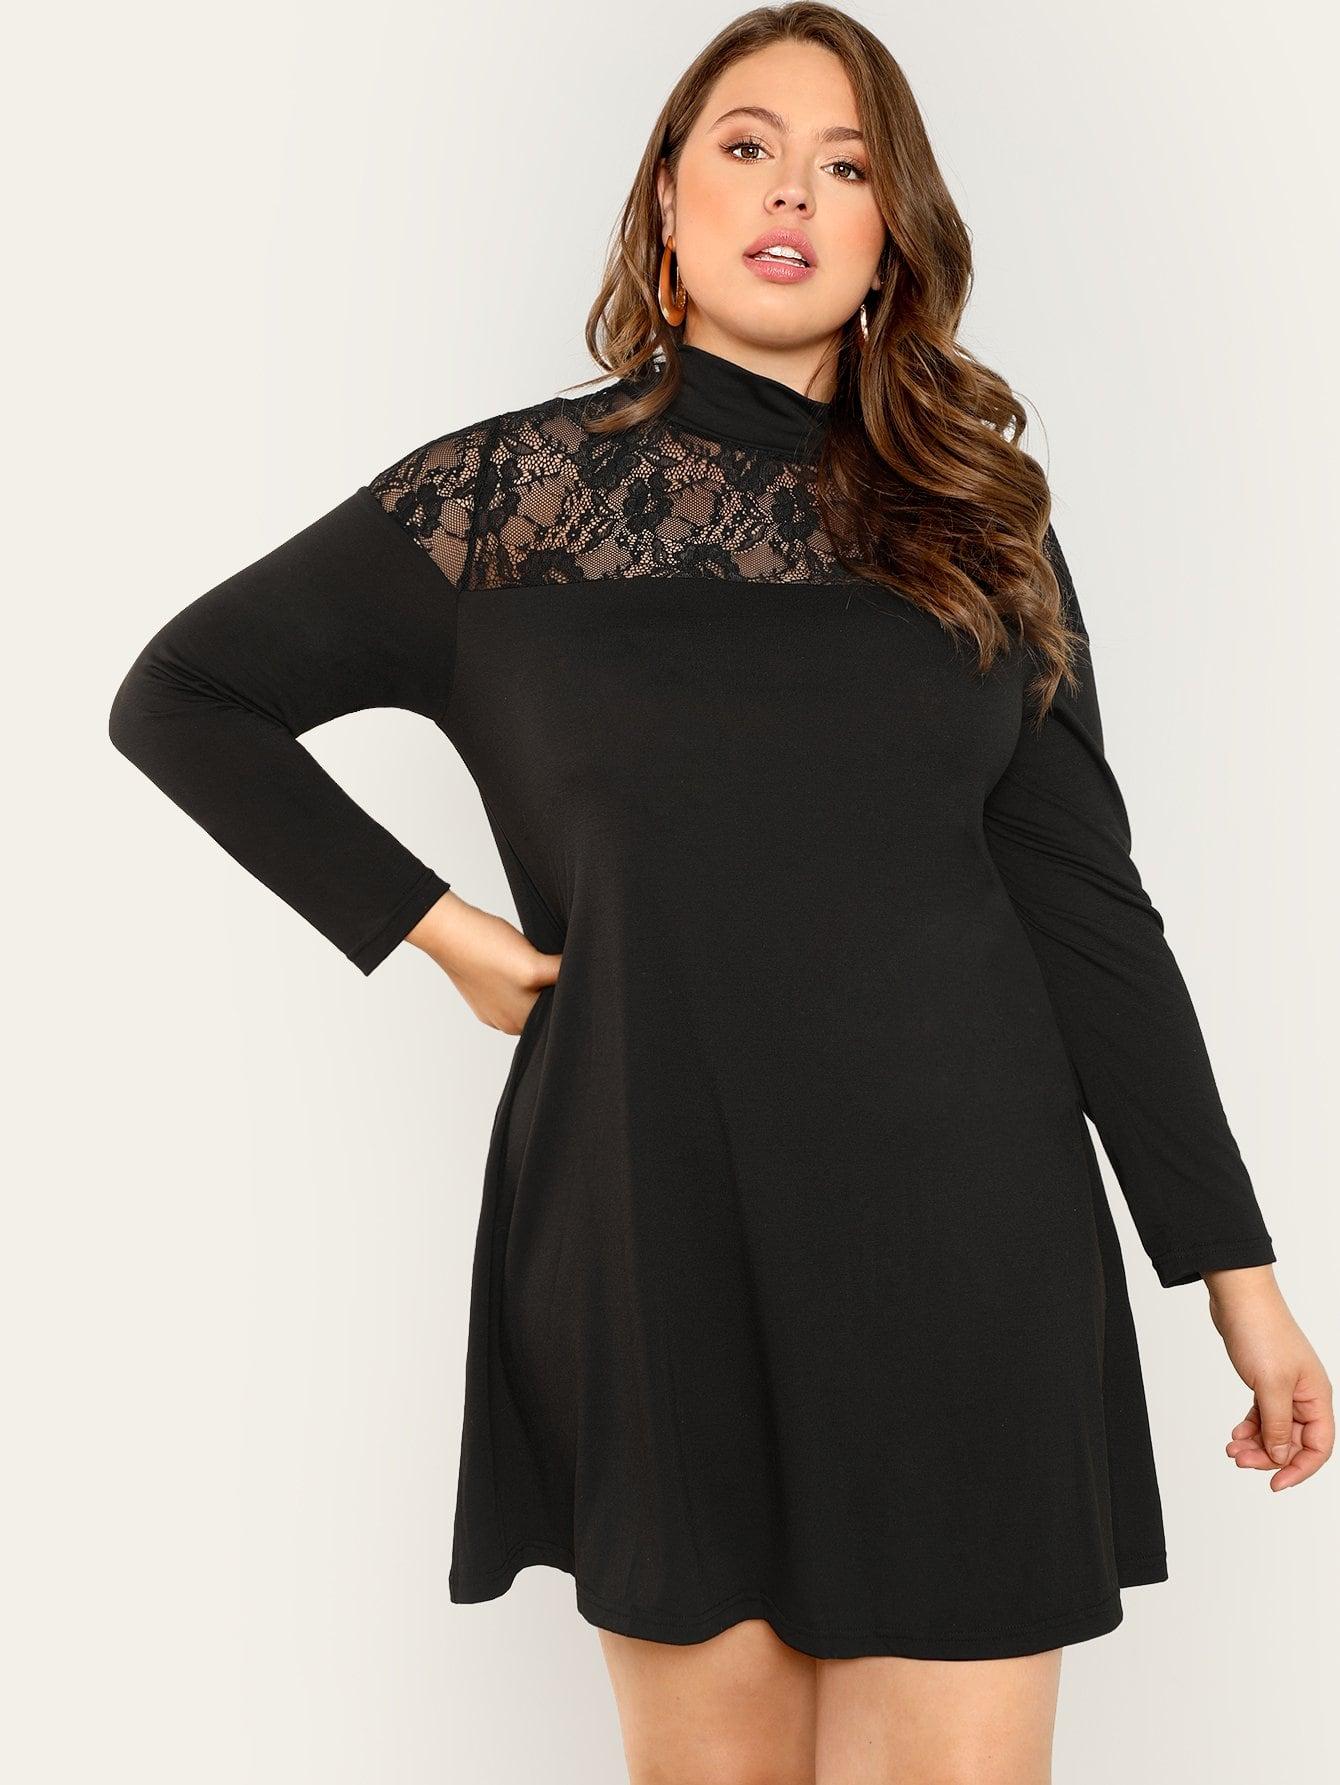 Sheer Lace Yoke Tee Dress  7c509946c